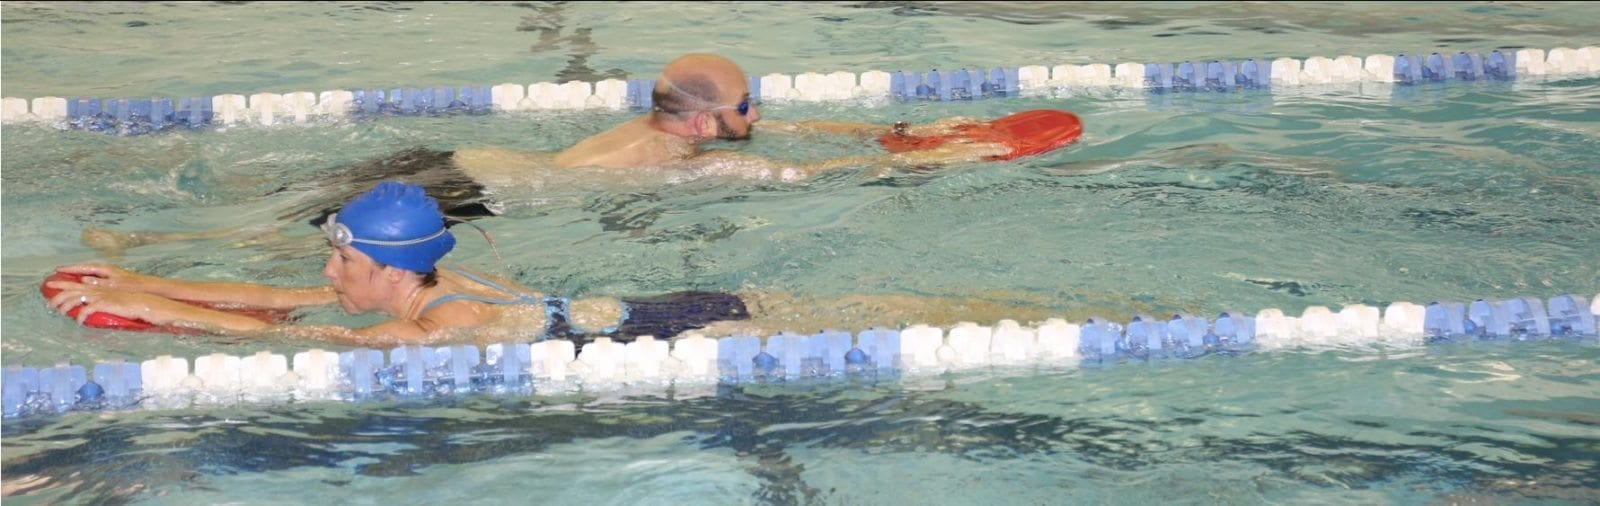 Adult Aquatics Program Photo Image